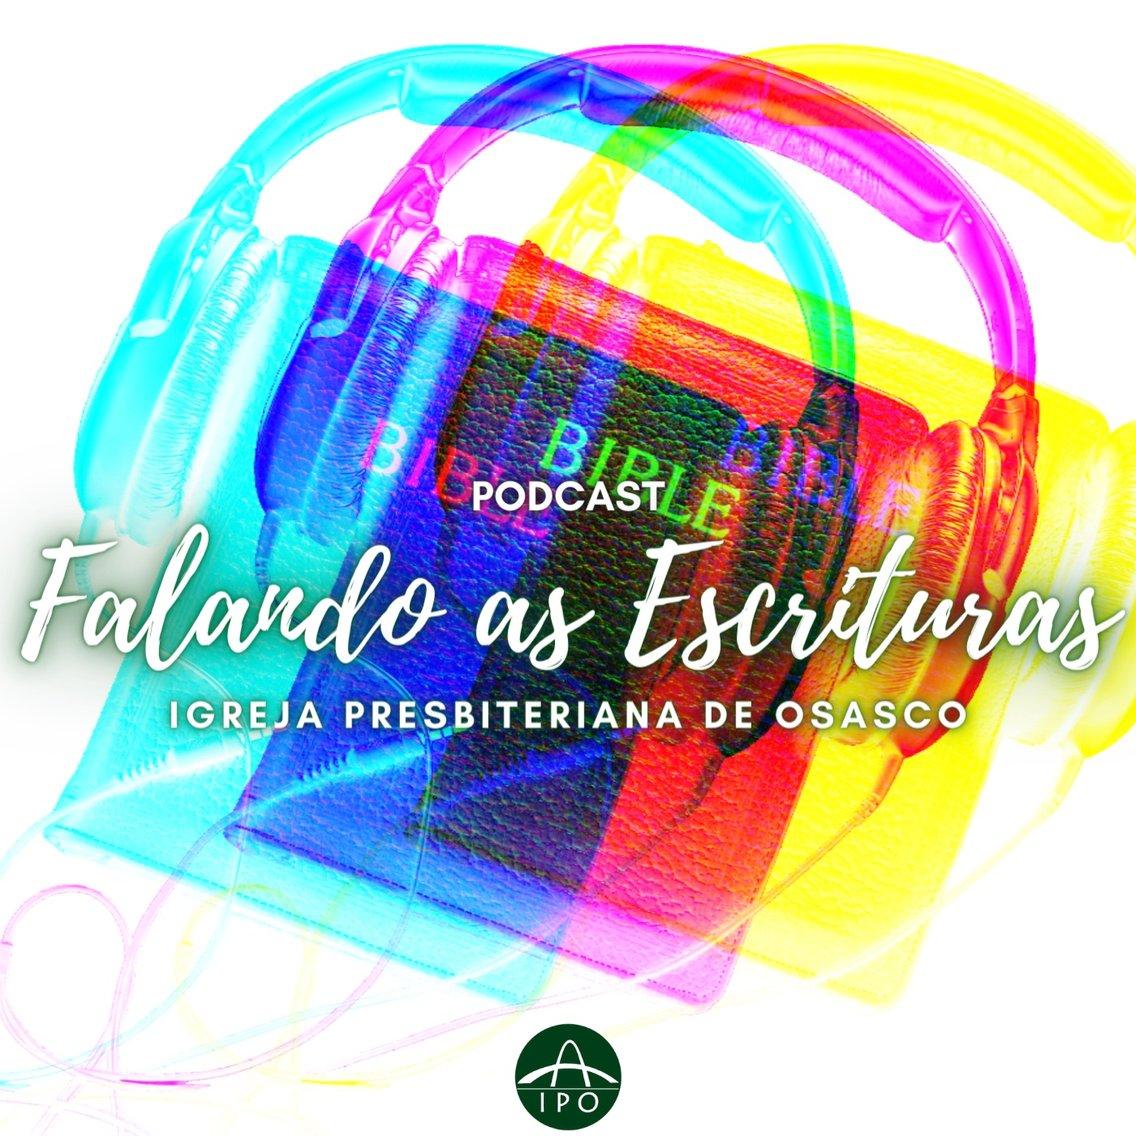 Falando as Escrituras - Cover Image